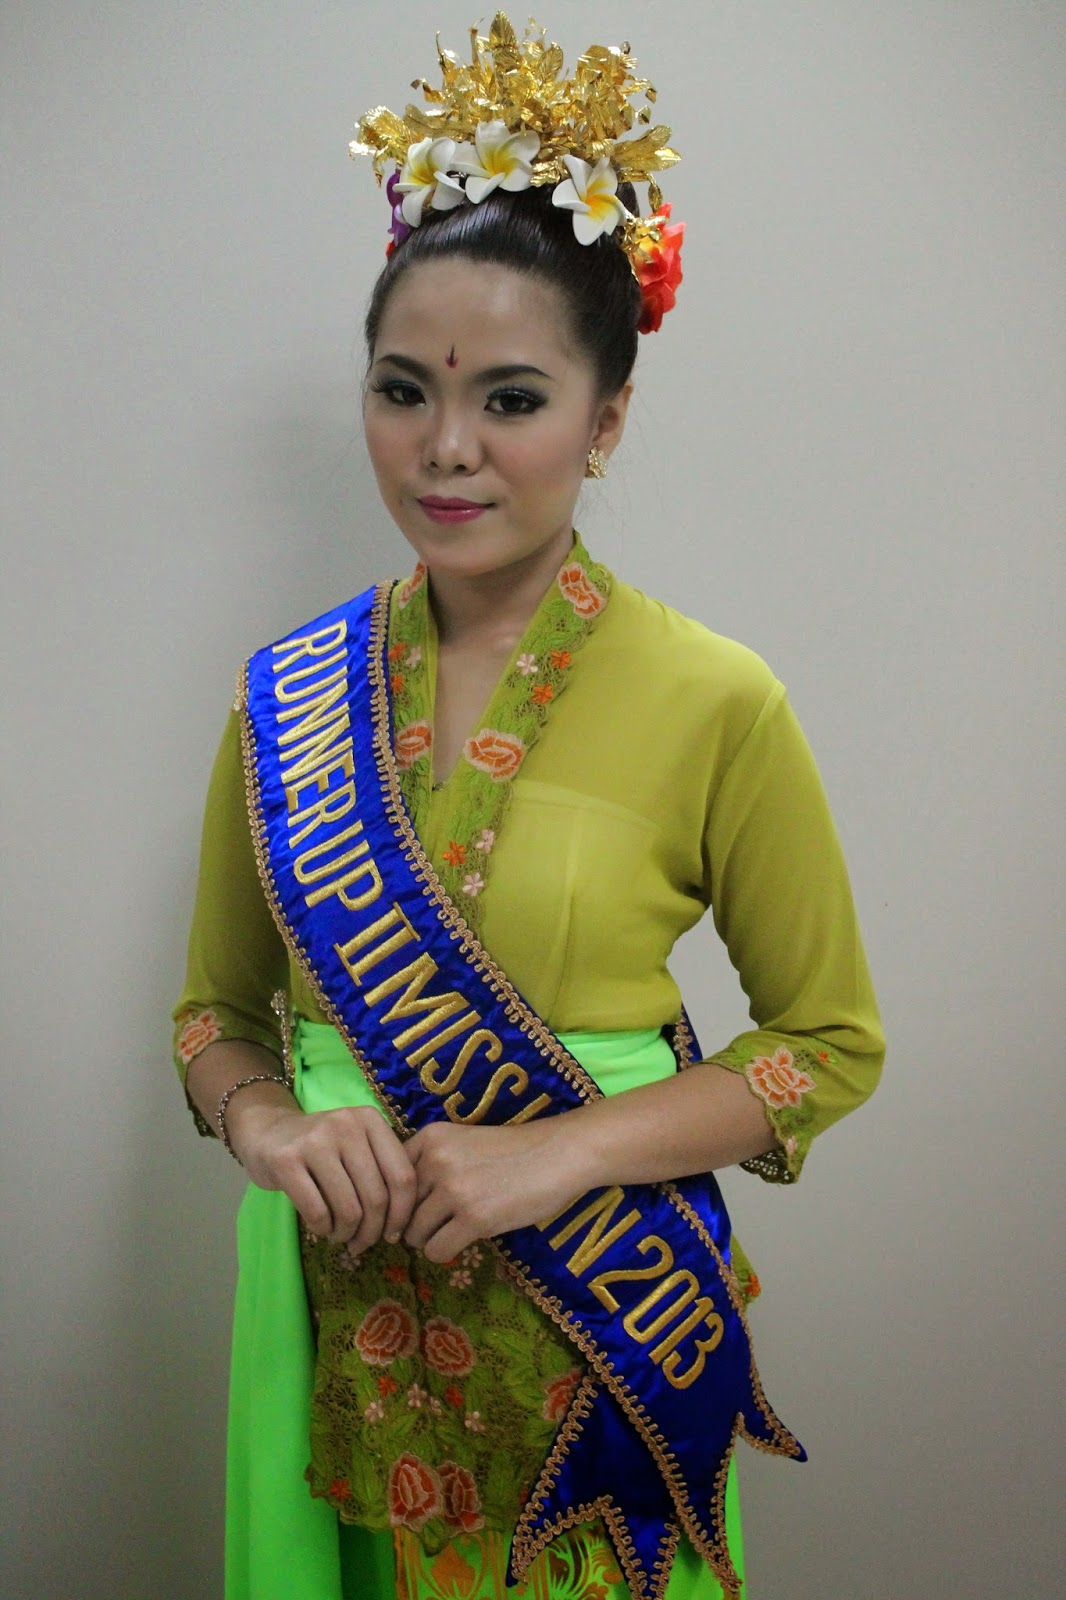 Indonesia anak sma jawa tengah beraksi - 3 part 2